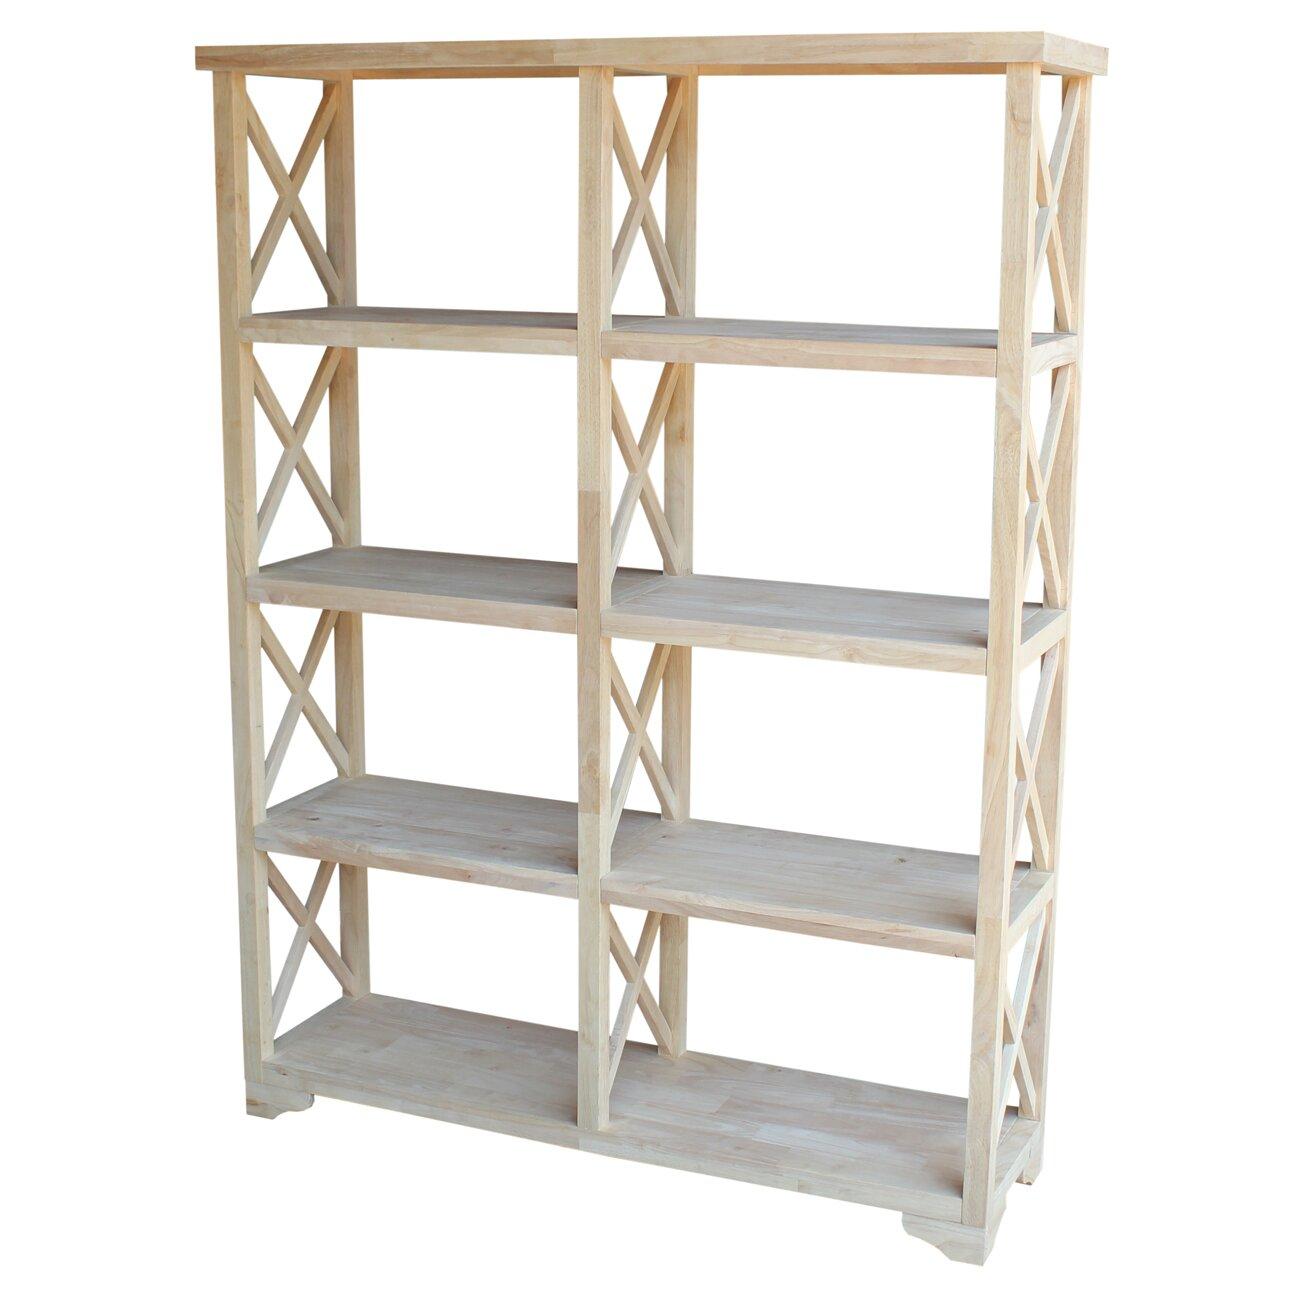 international concepts x design 72 etagere bookcase. Black Bedroom Furniture Sets. Home Design Ideas